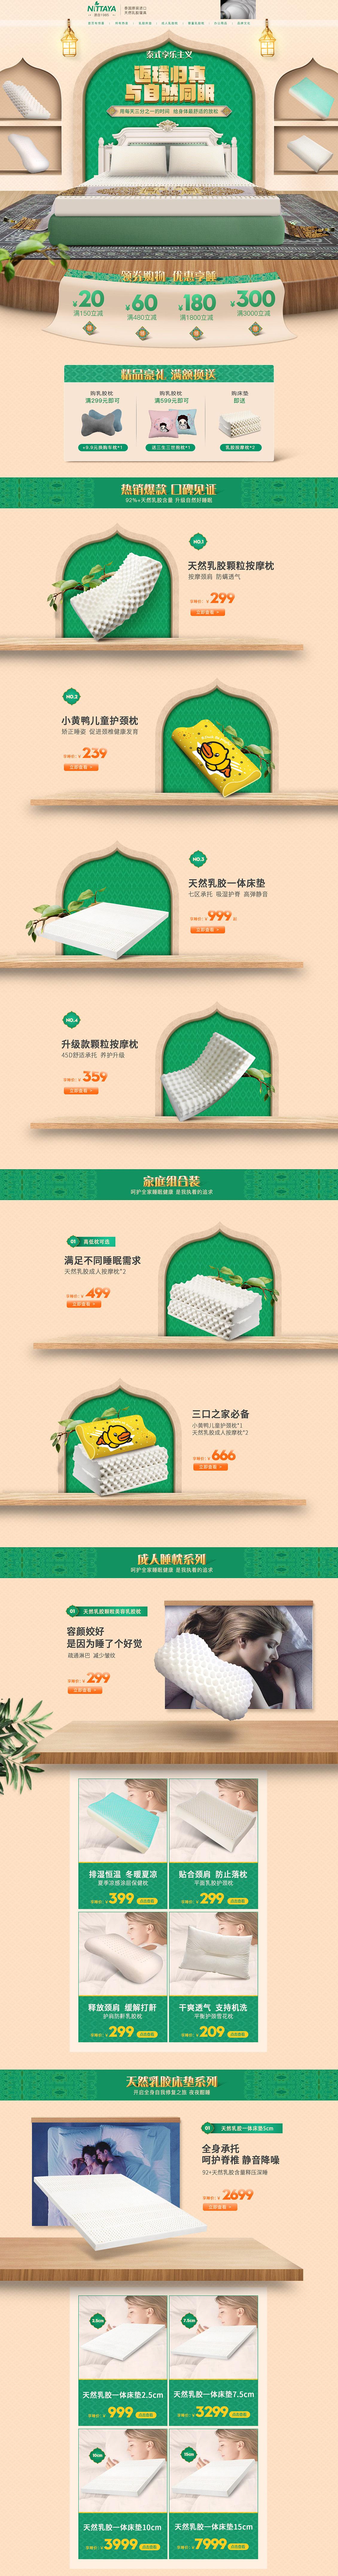 NITTAYA 乳胶枕头 家居用品 年货节 新年 天猫首页网页设计